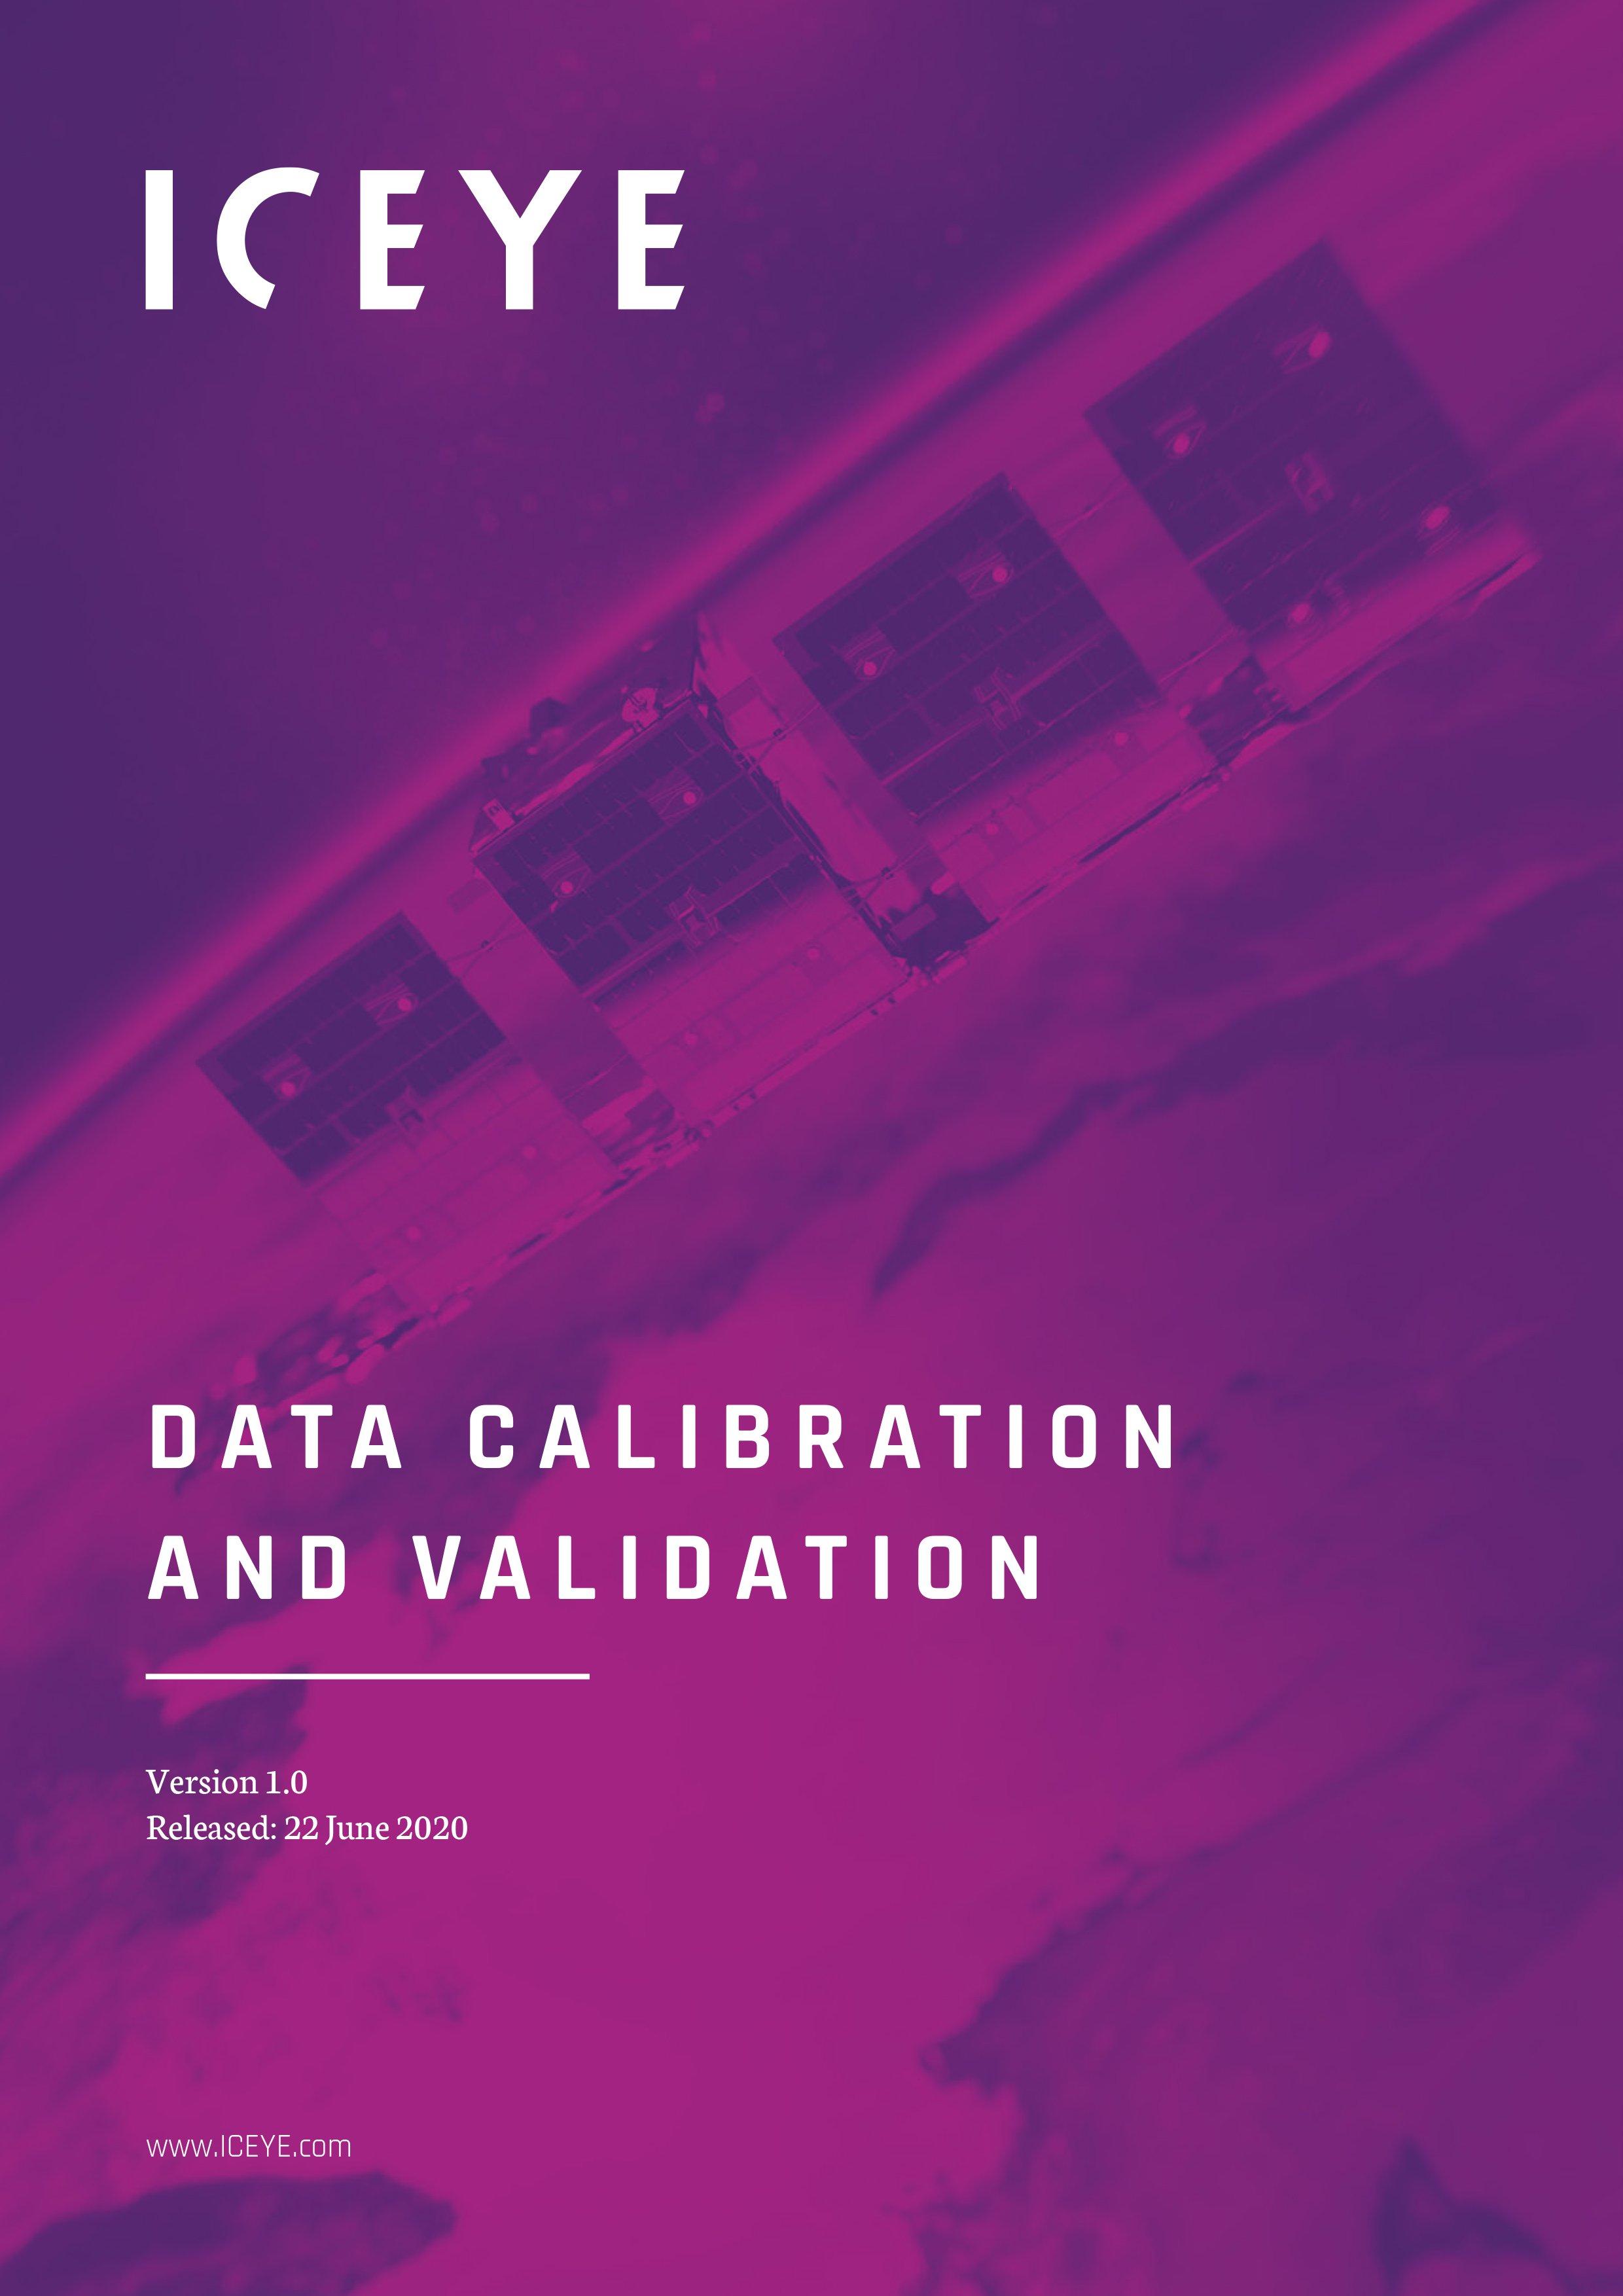 calibration and validation brochure-1